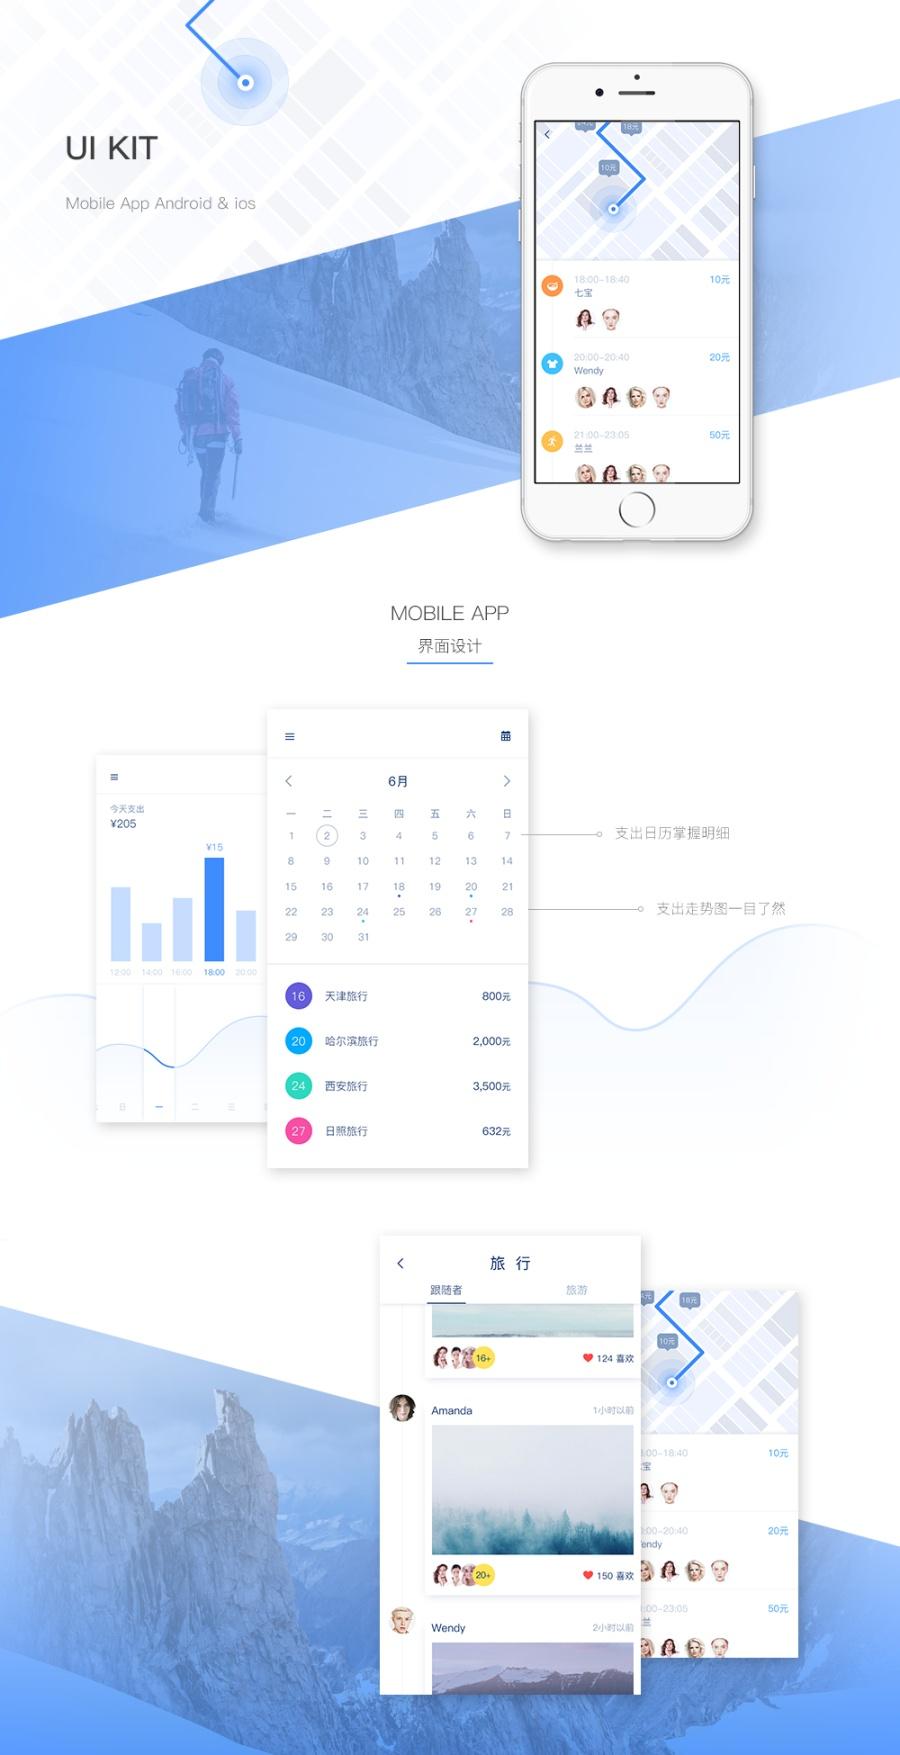 UI|小七爷爷-原创设计作品-站酷(ZCOOL)2018建筑设计6年竞赛图片